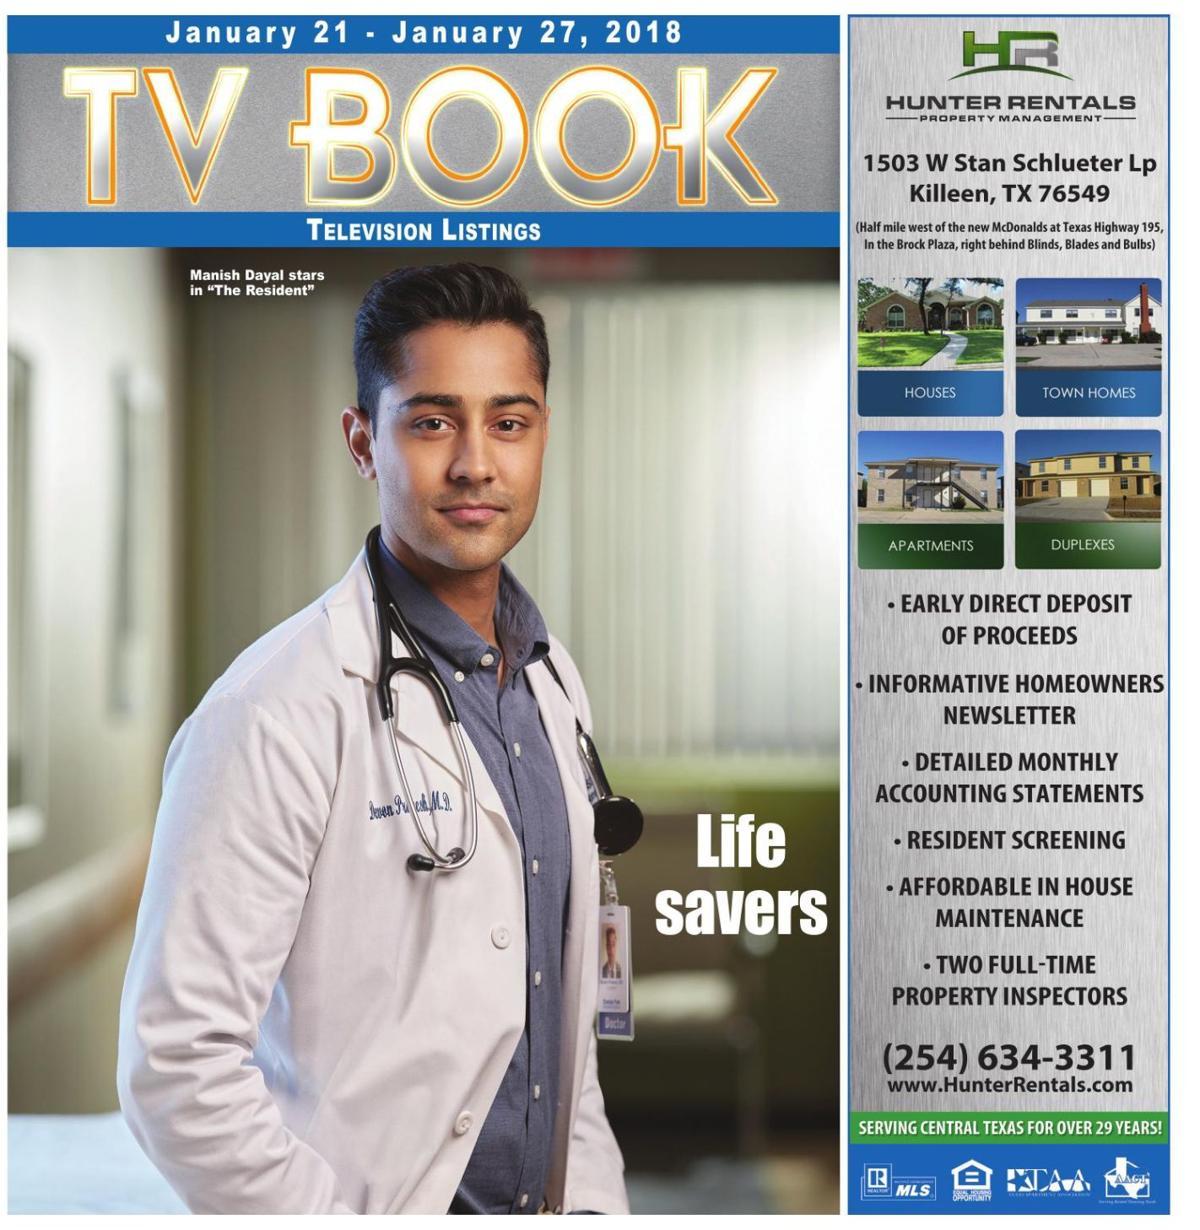 TV Book Jan 21st - Jan 27th